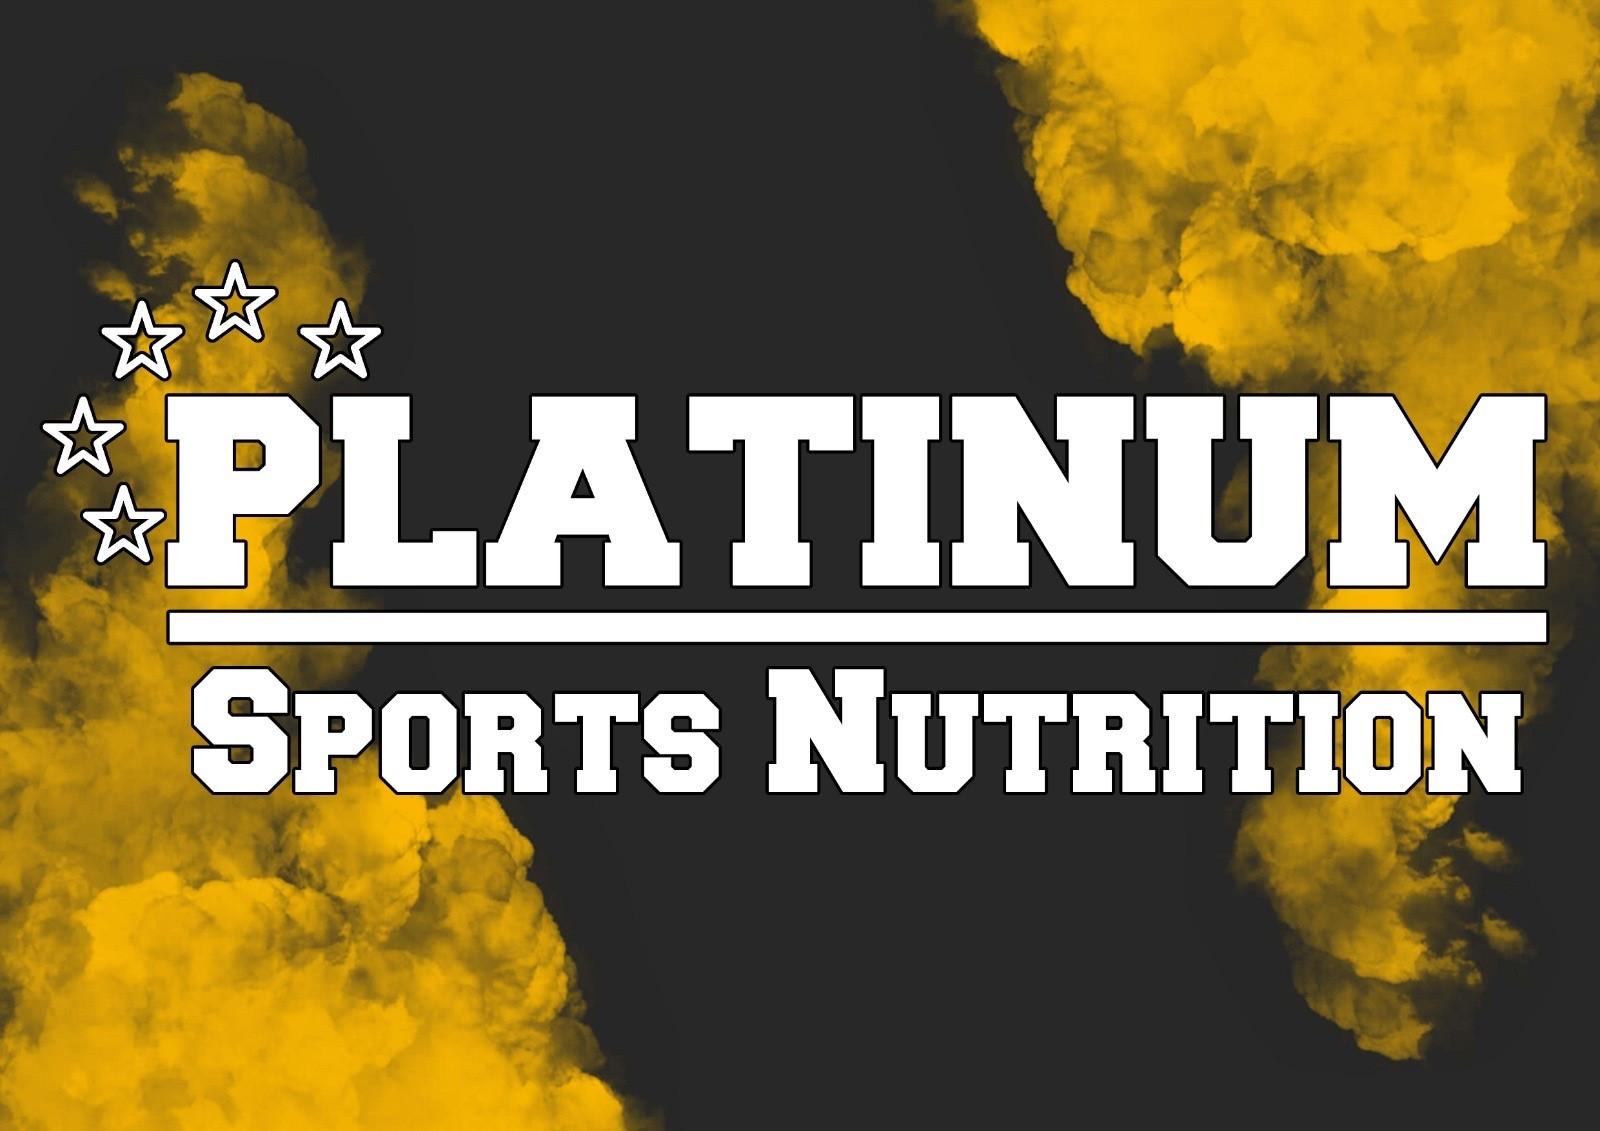 Platinum sports nutrition